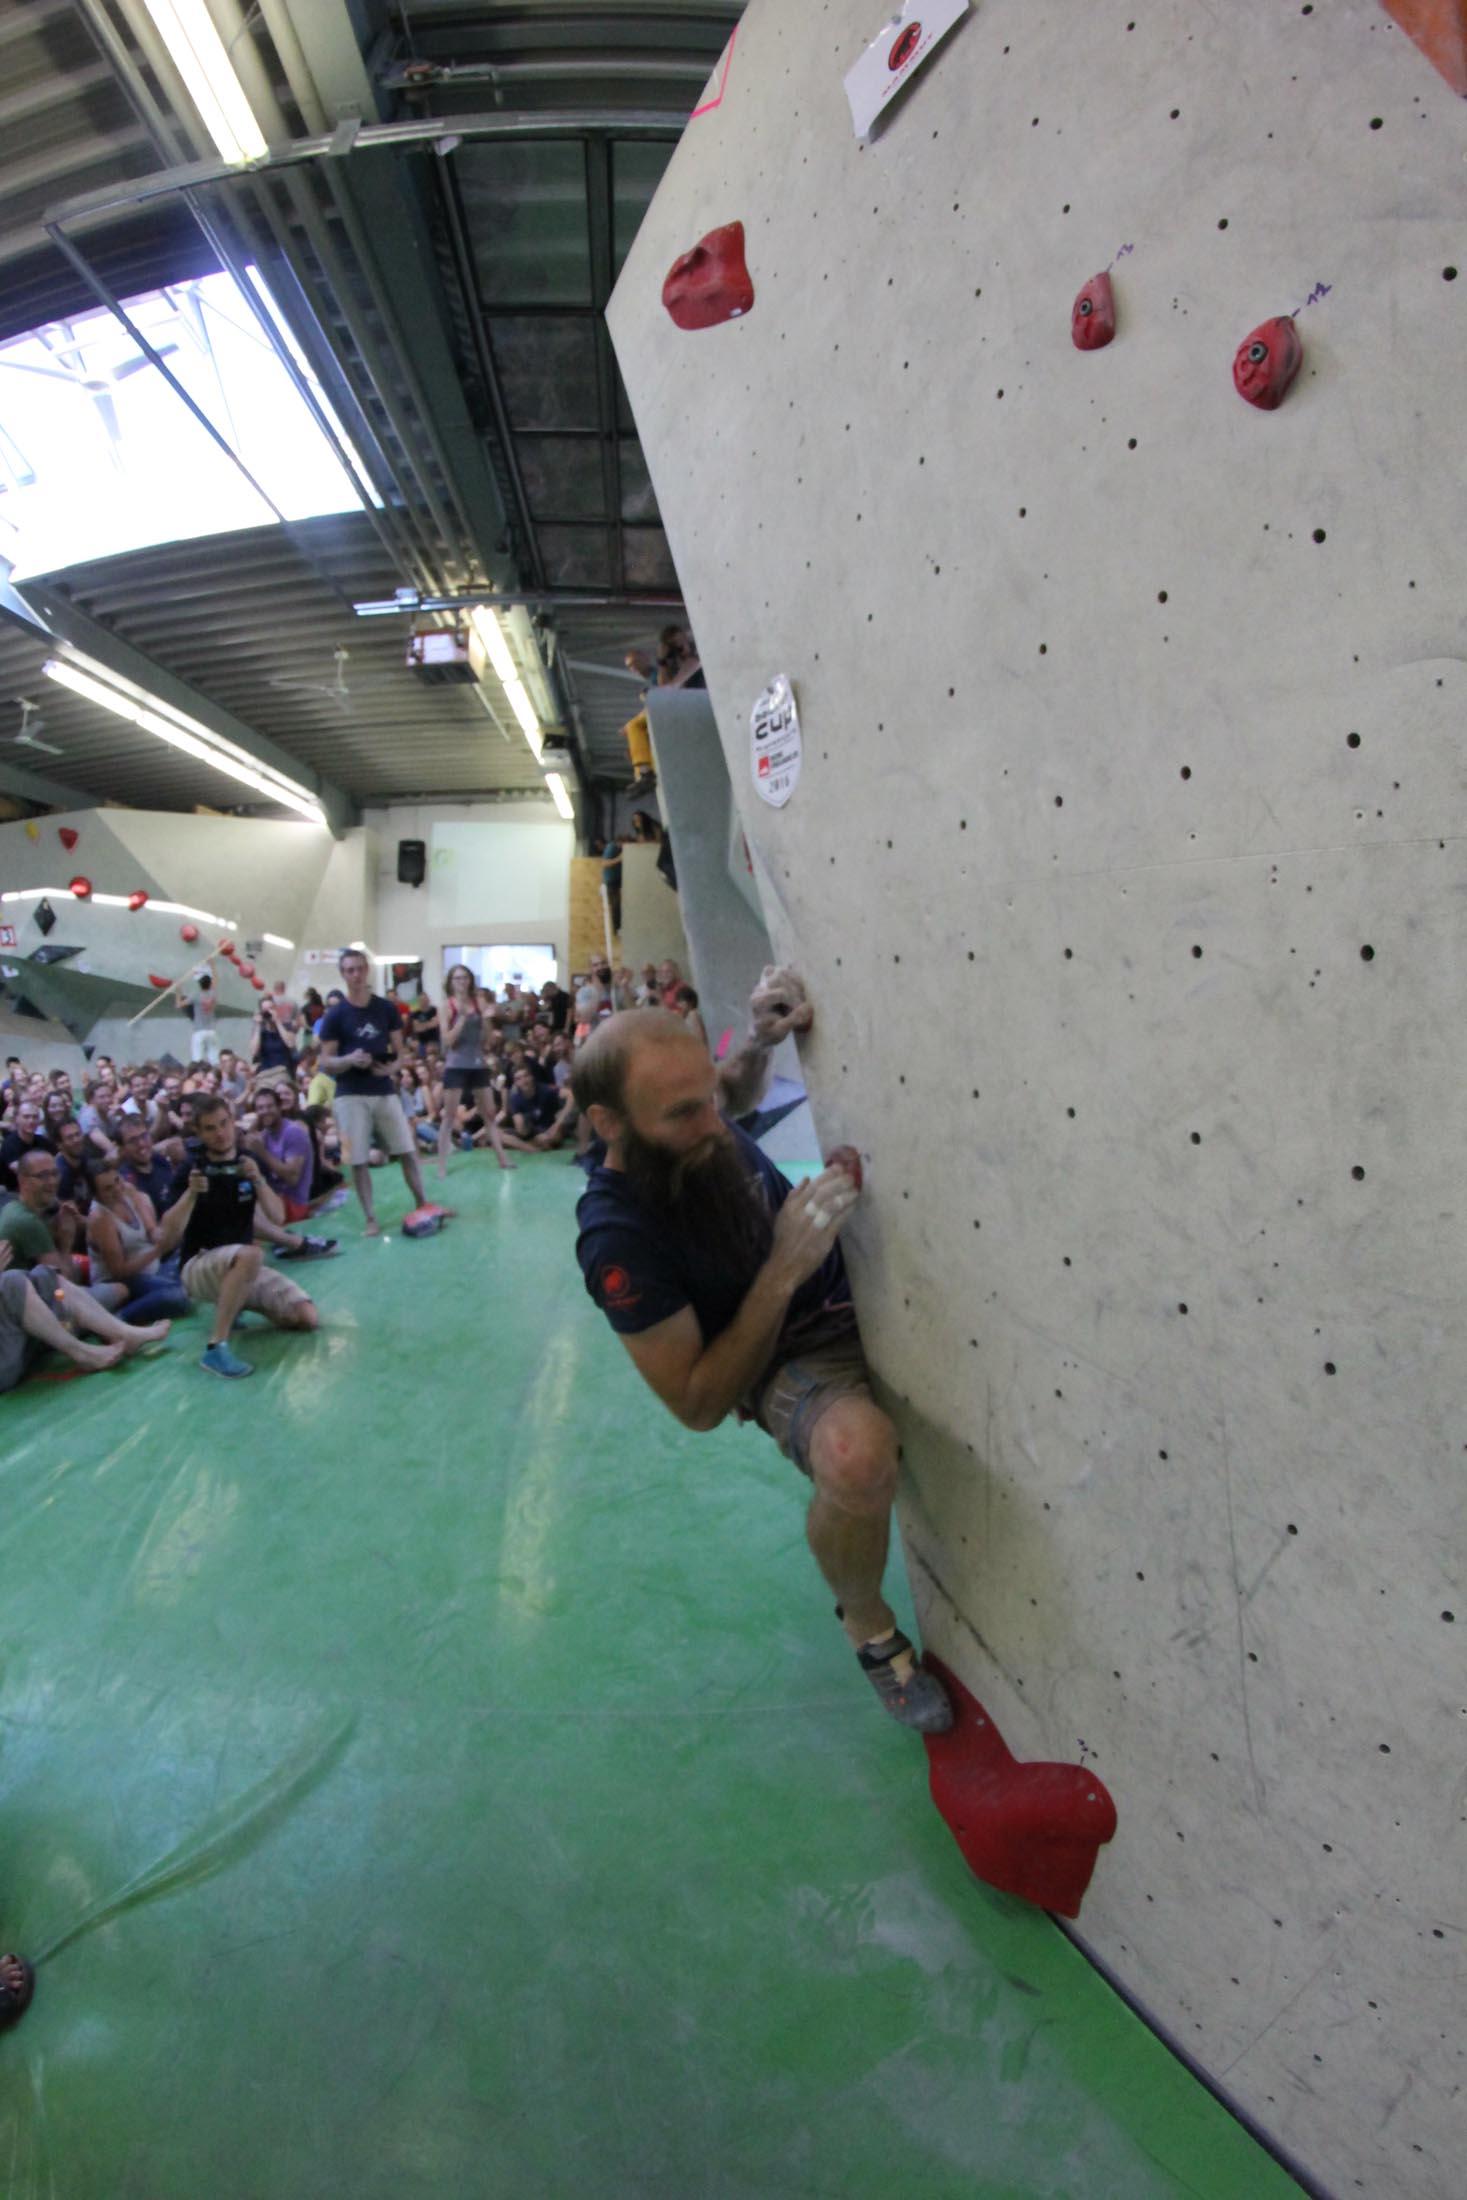 Finale, internationaler bouldercup Frankenjura 2016, BLOCKHELDEN Erlangen, Mammut, Bergfreunde.de, Boulderwettkampf07092016599